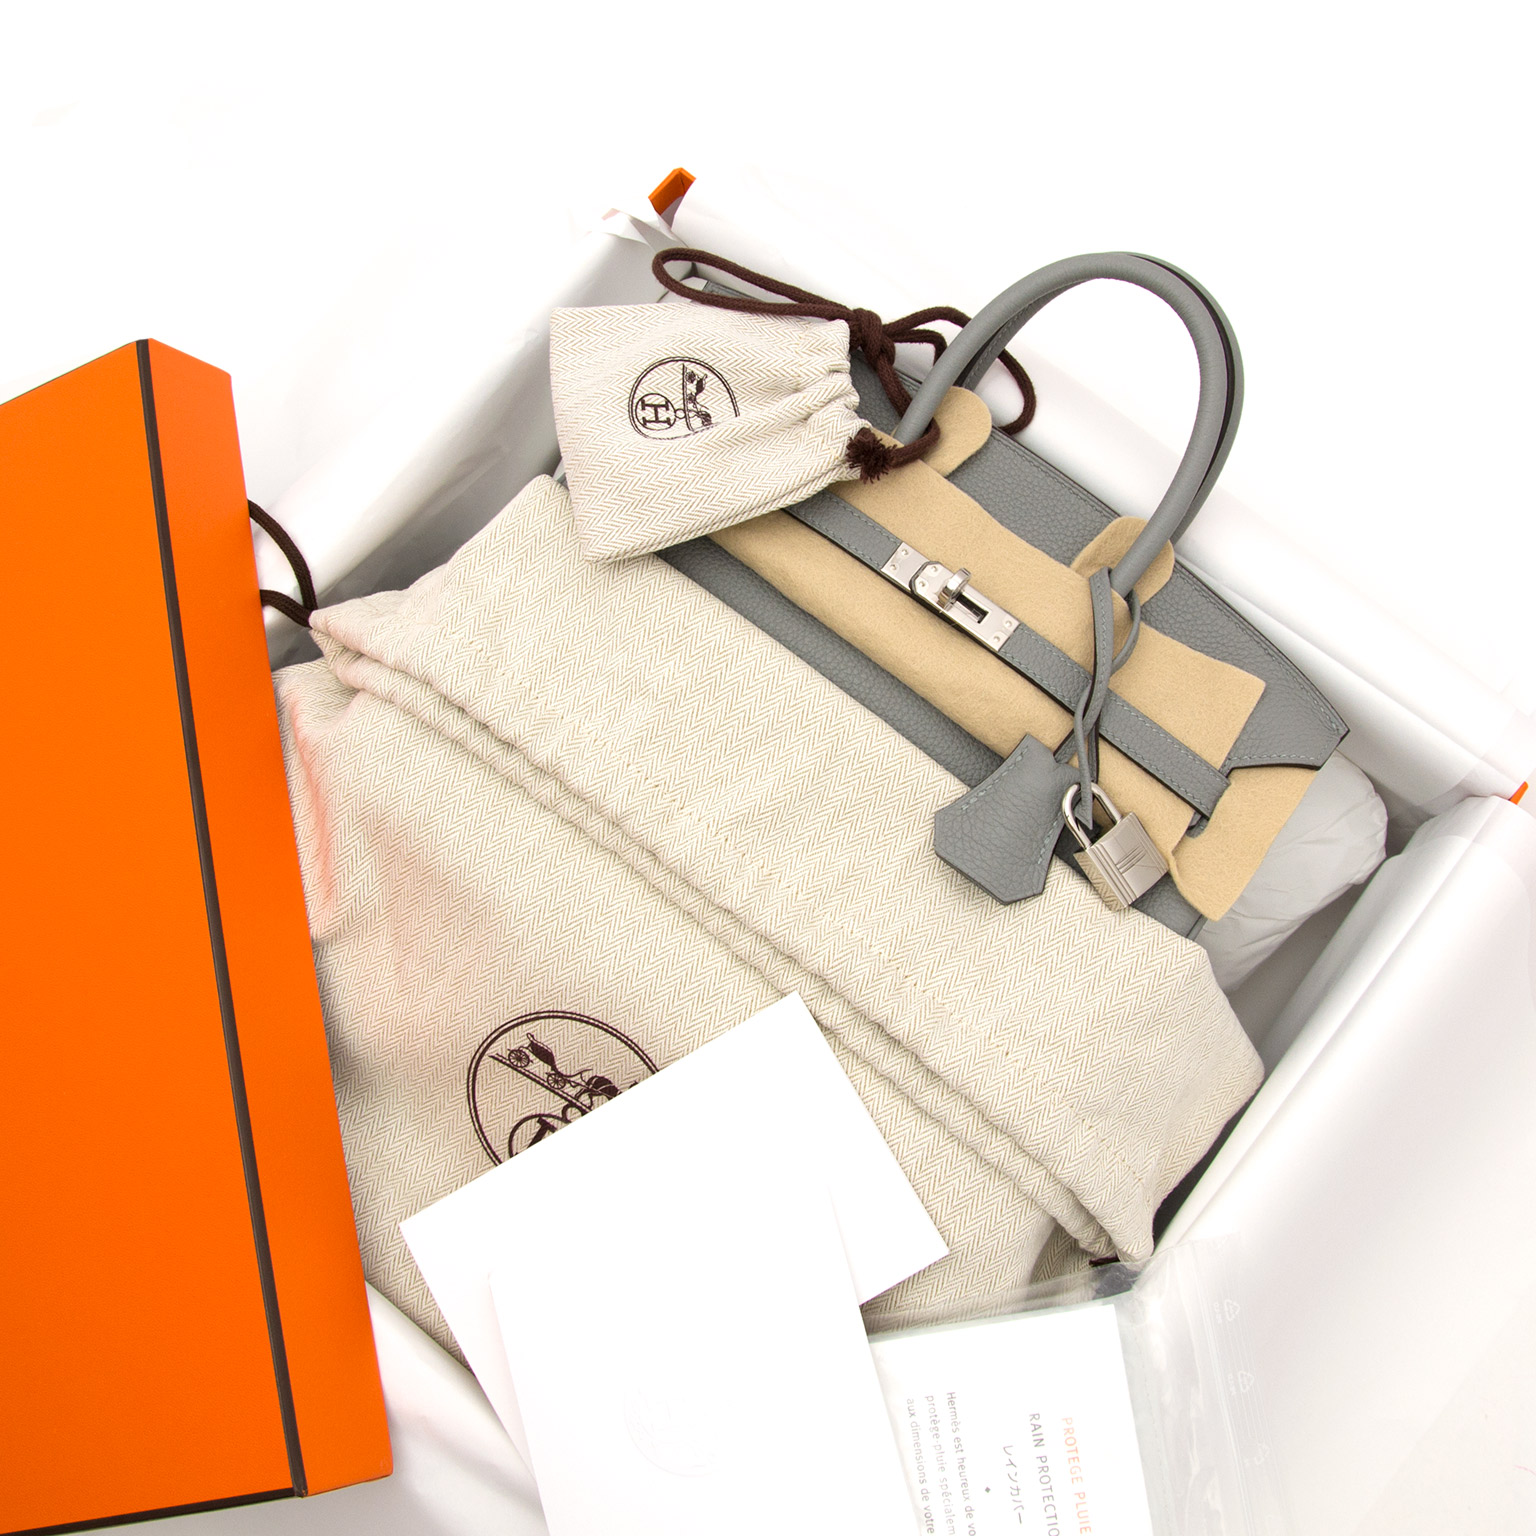 acheter en ligne comme neuf sac a mainBrand New Birkin 25 Gris Mouette Togo PHW